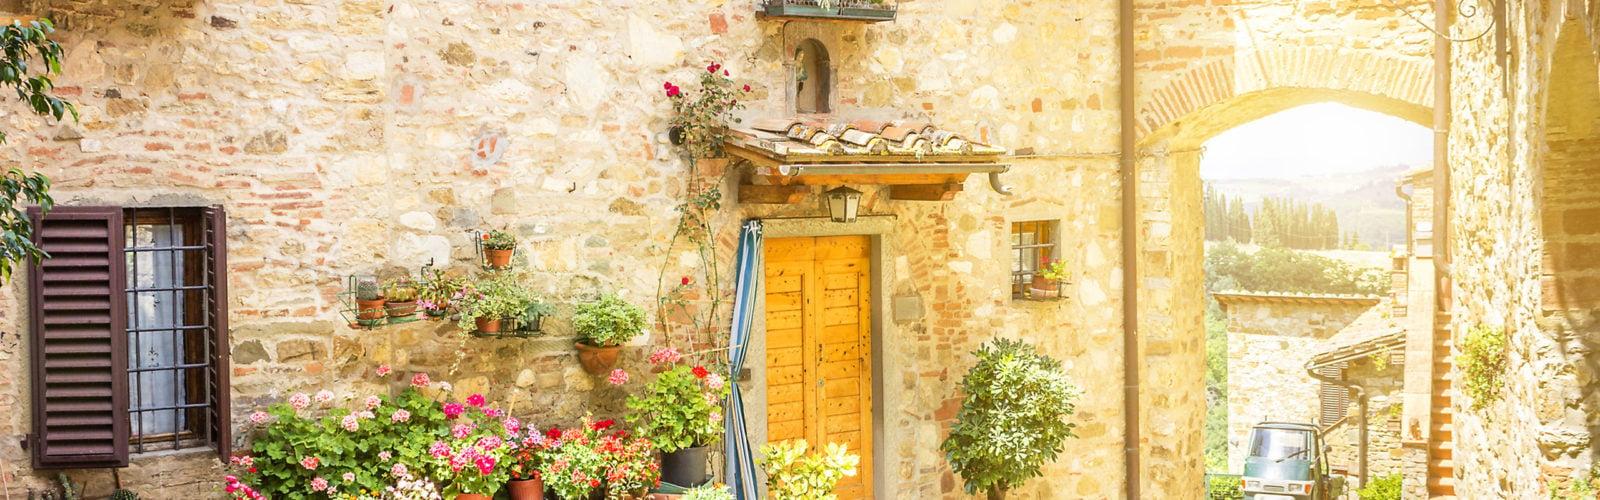 Village in the Chianti region of Tuscany, Italy